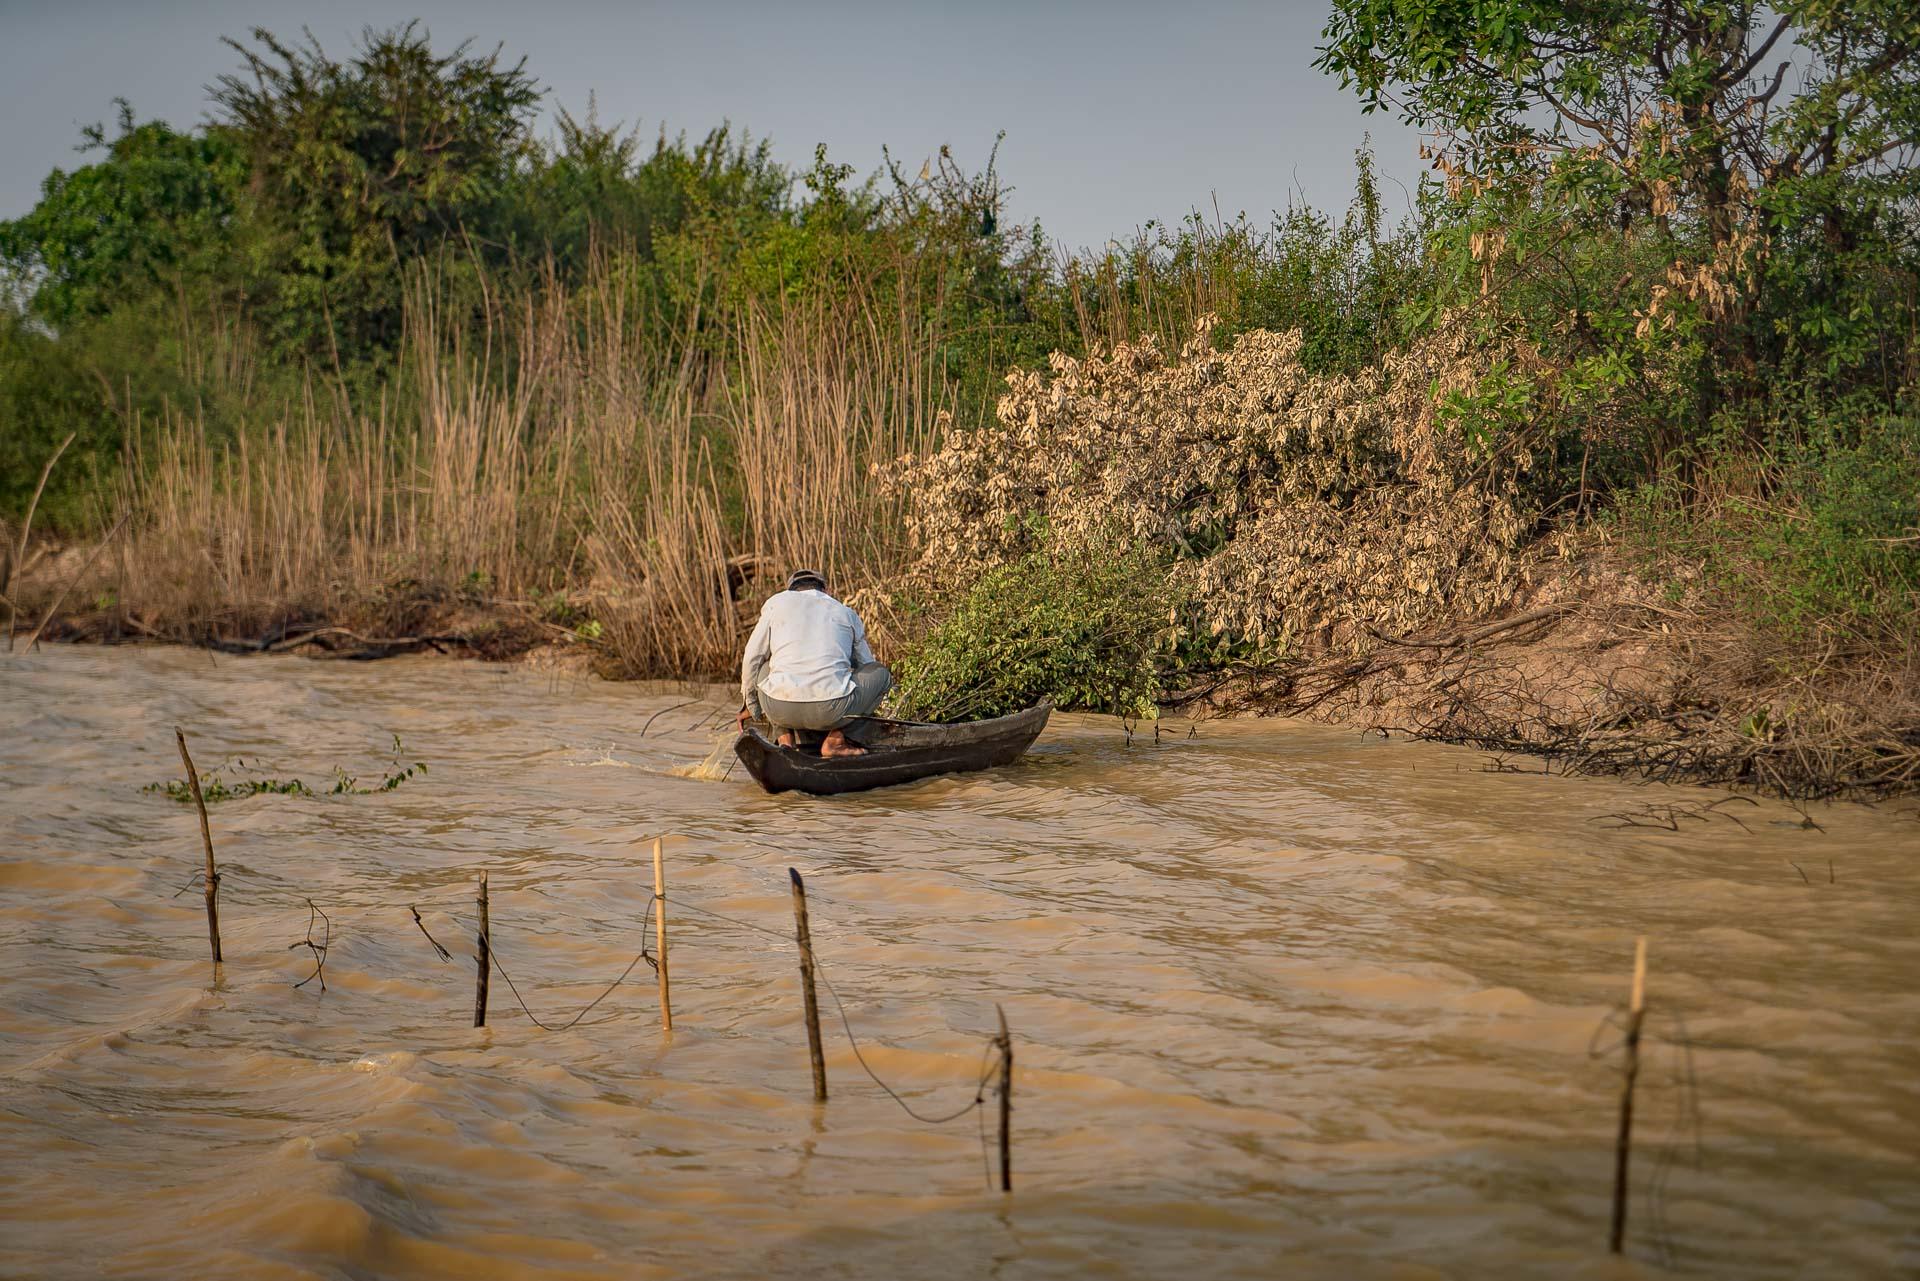 Lesvoyageuses-guide-voyage-siem-reap-angkor-cambodge-lavender-jeep-6